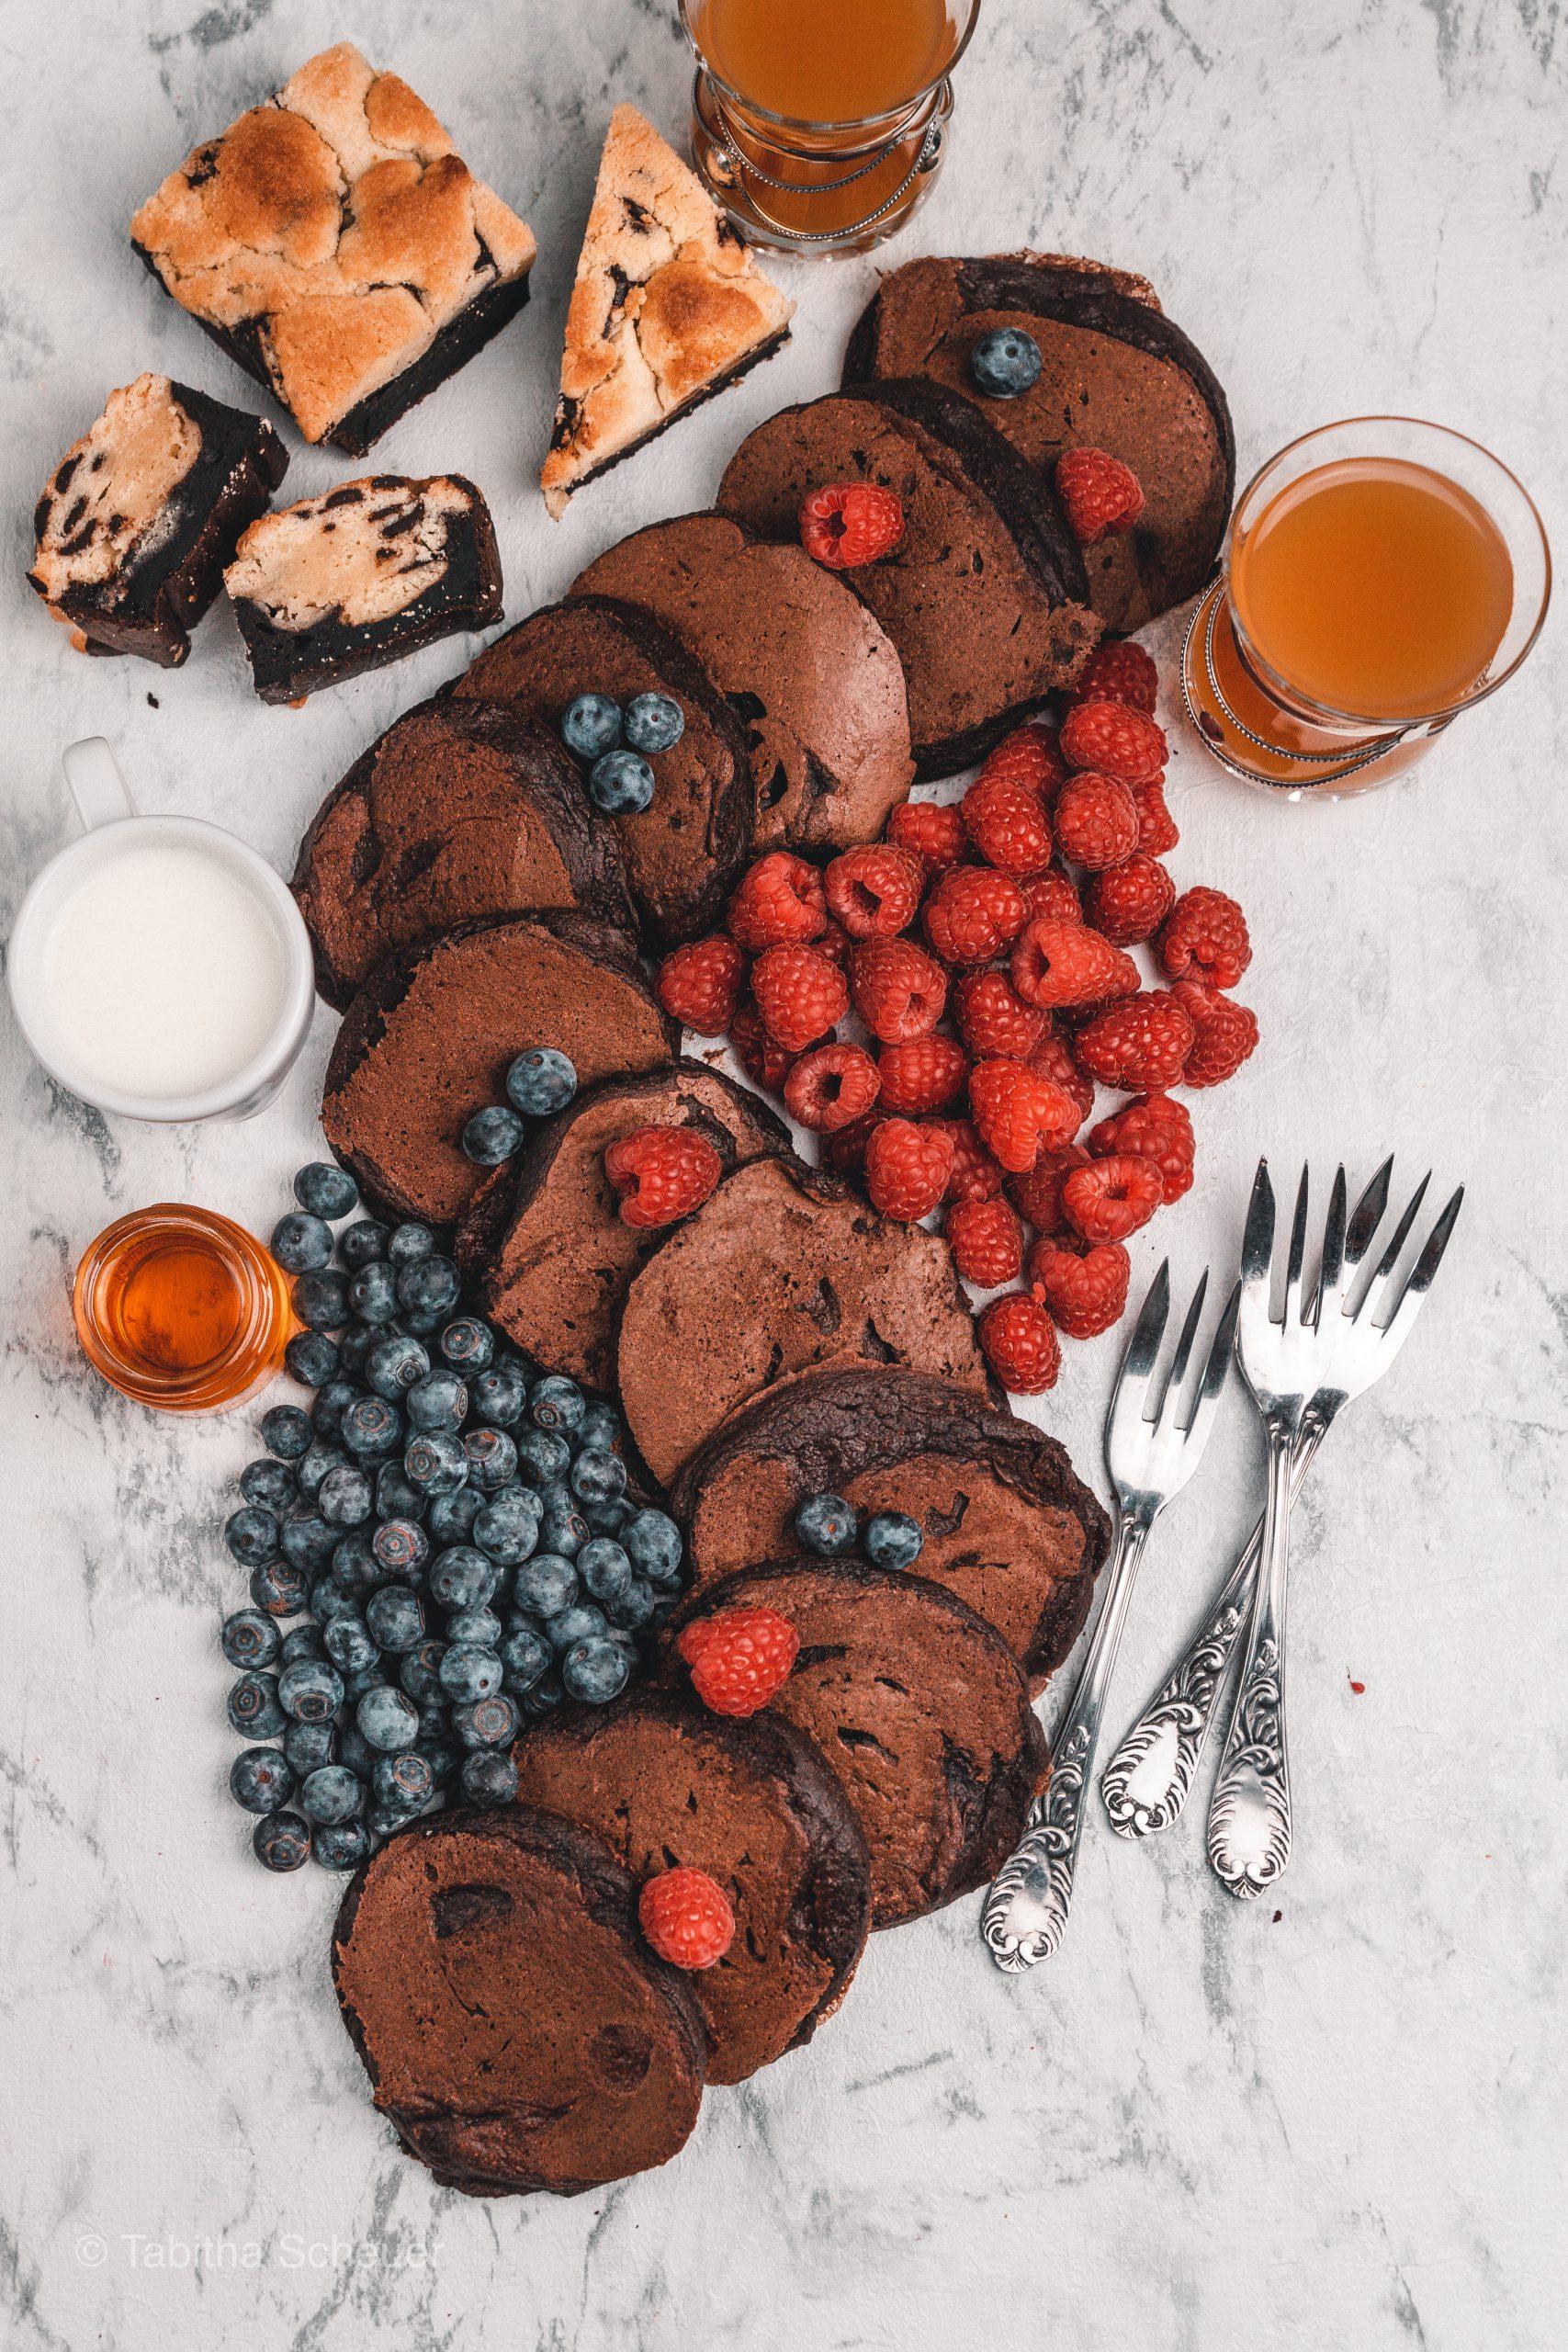 mariashealthytreats Blog |Foodblog |Schoko-Pfannkuchen |Schoko-Pancakes